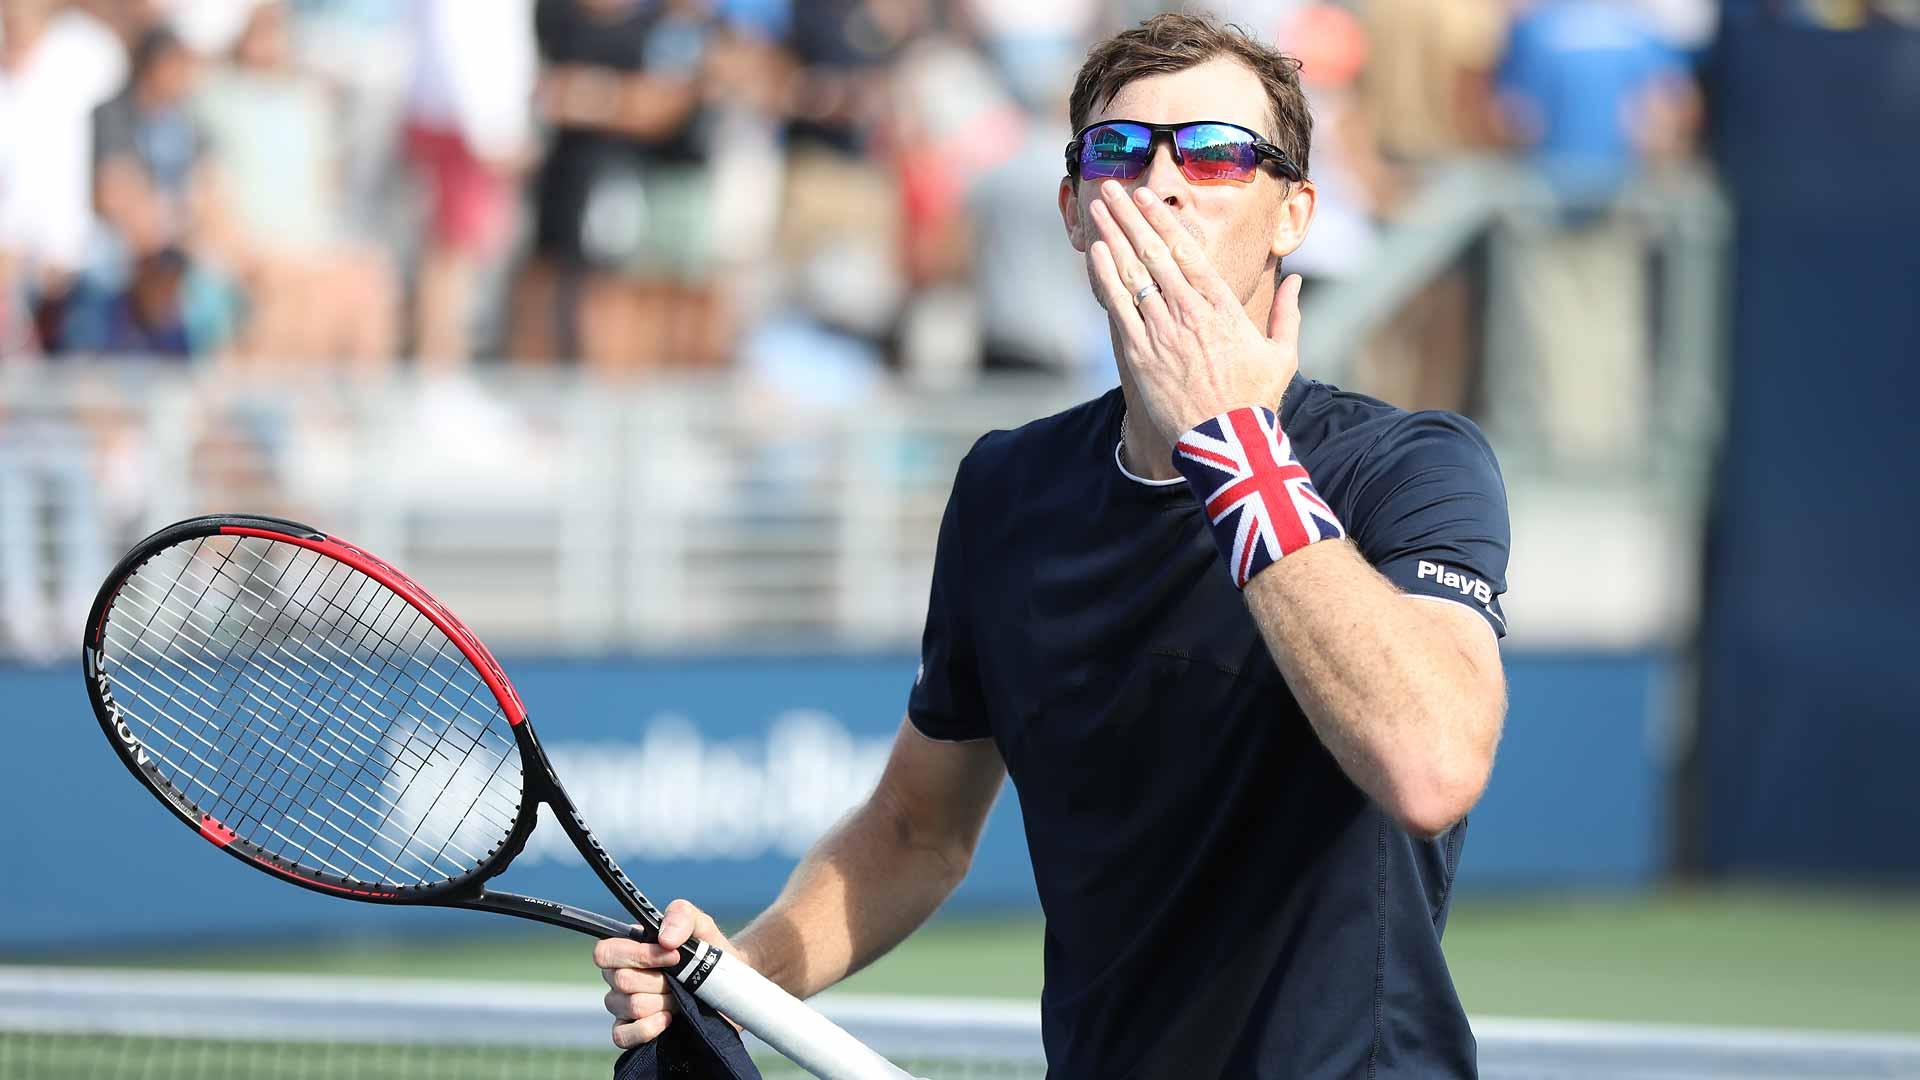 Jamie Murray & Neal Skupski March Into US Open Quarter ...